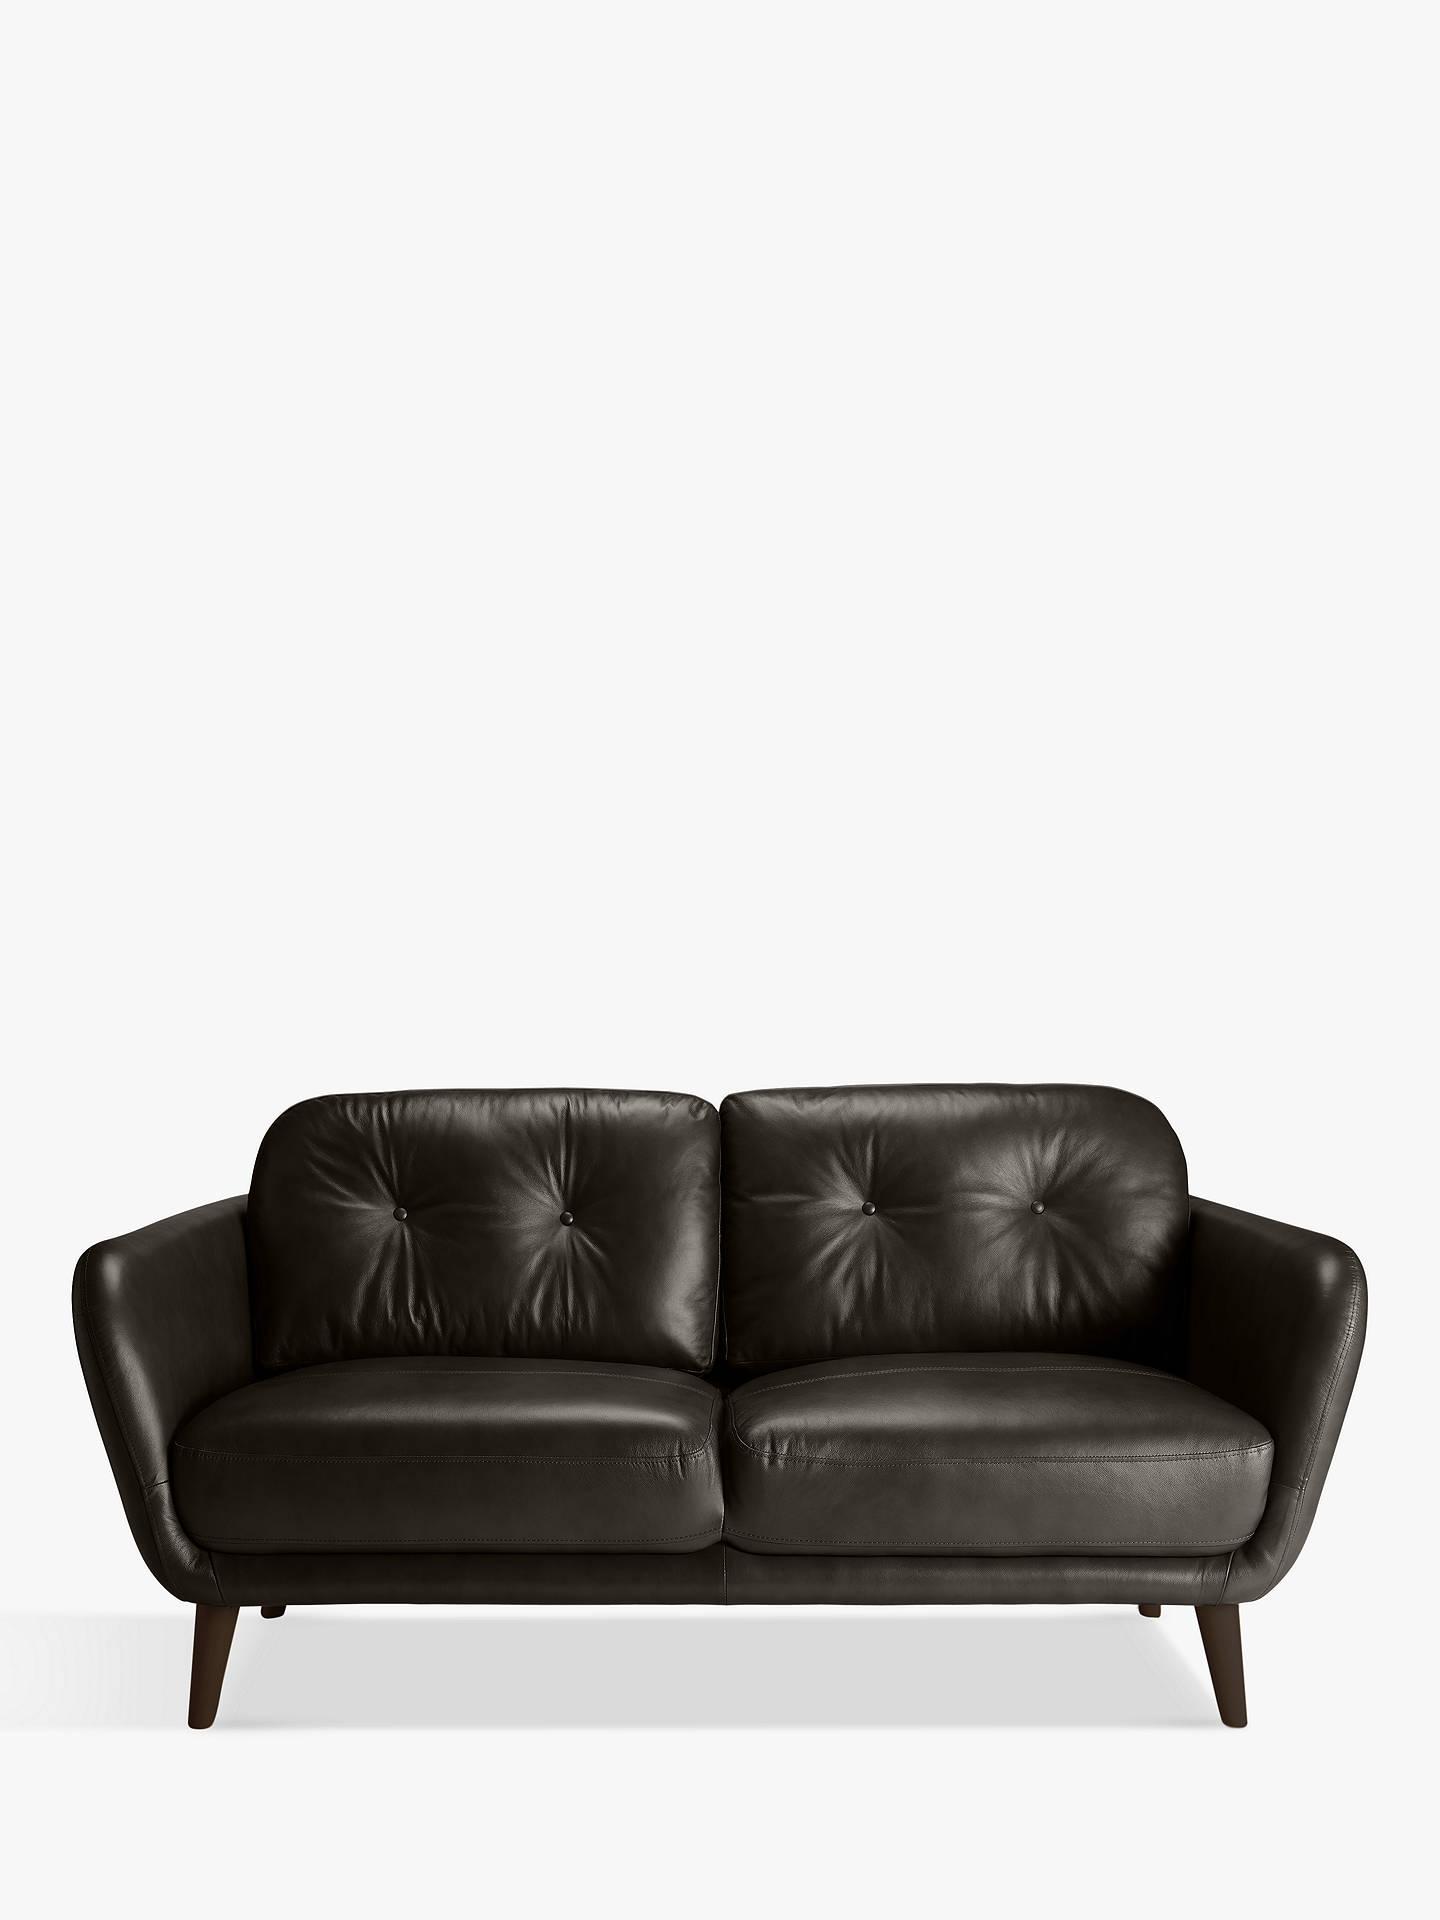 Outstanding House By John Lewis Arlo Medium 2 Seater Leather Sofa Milan Taupe Creativecarmelina Interior Chair Design Creativecarmelinacom